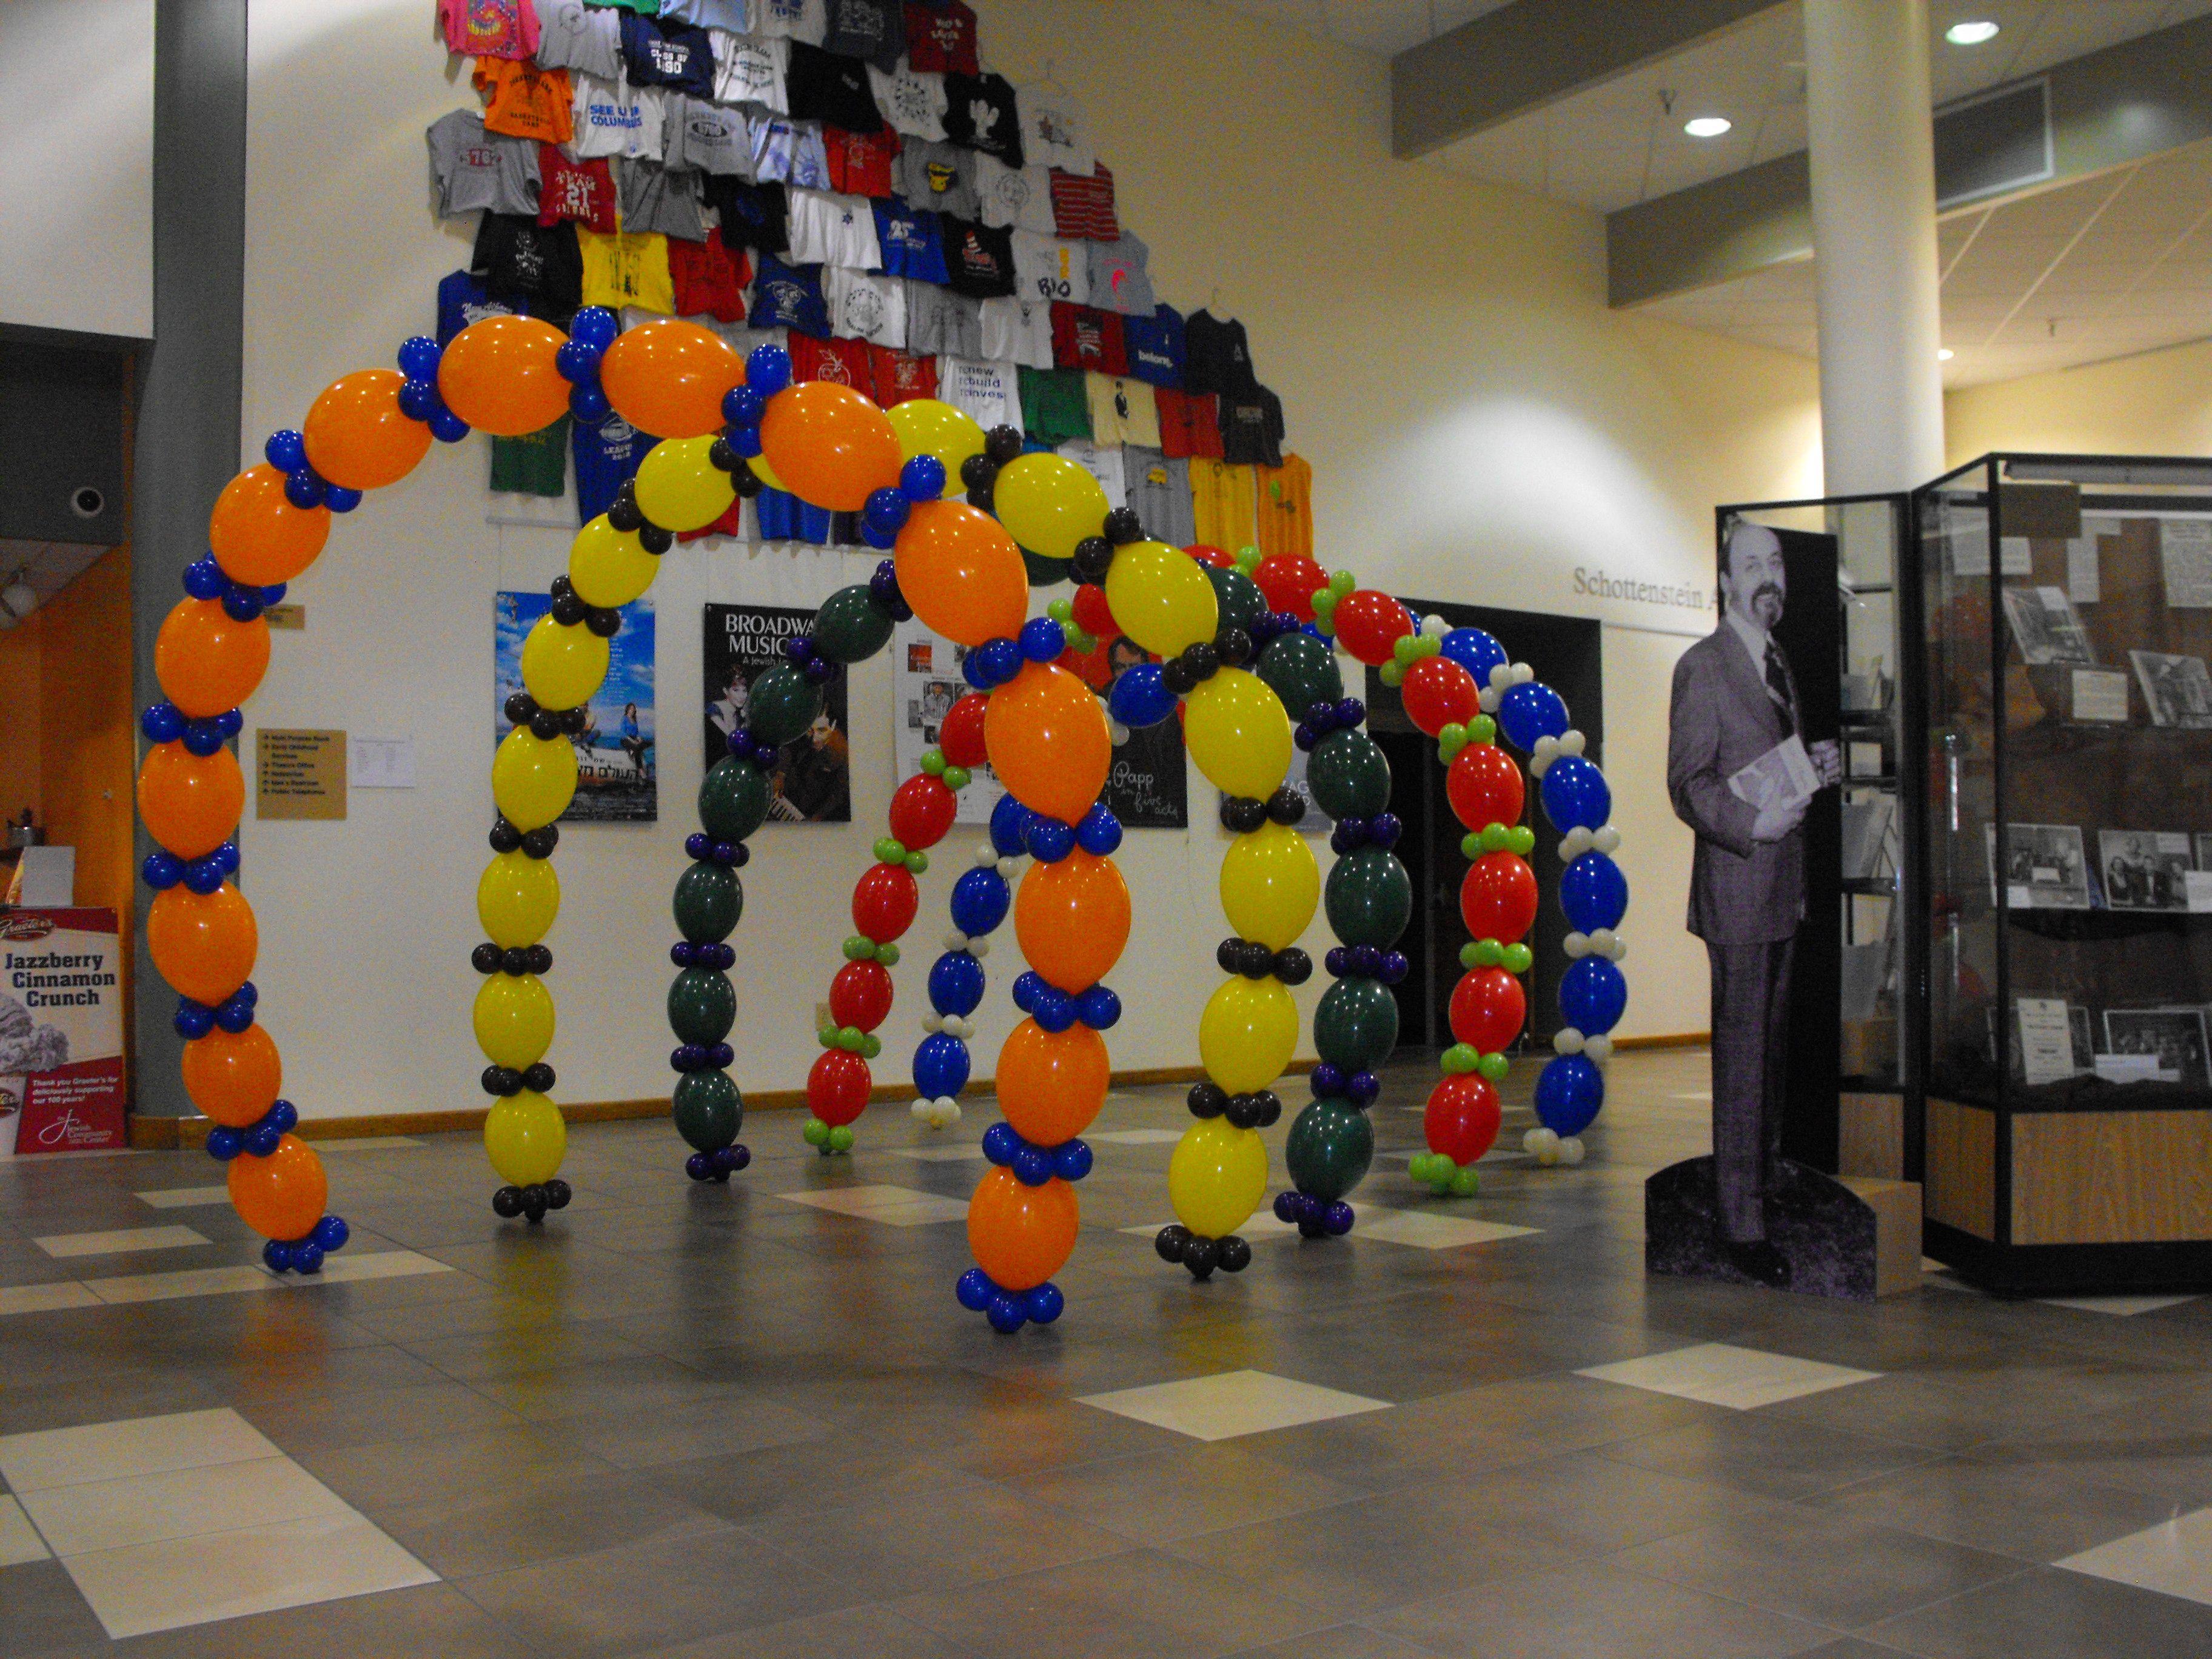 Balloon deco to celebrate the jewish community centers